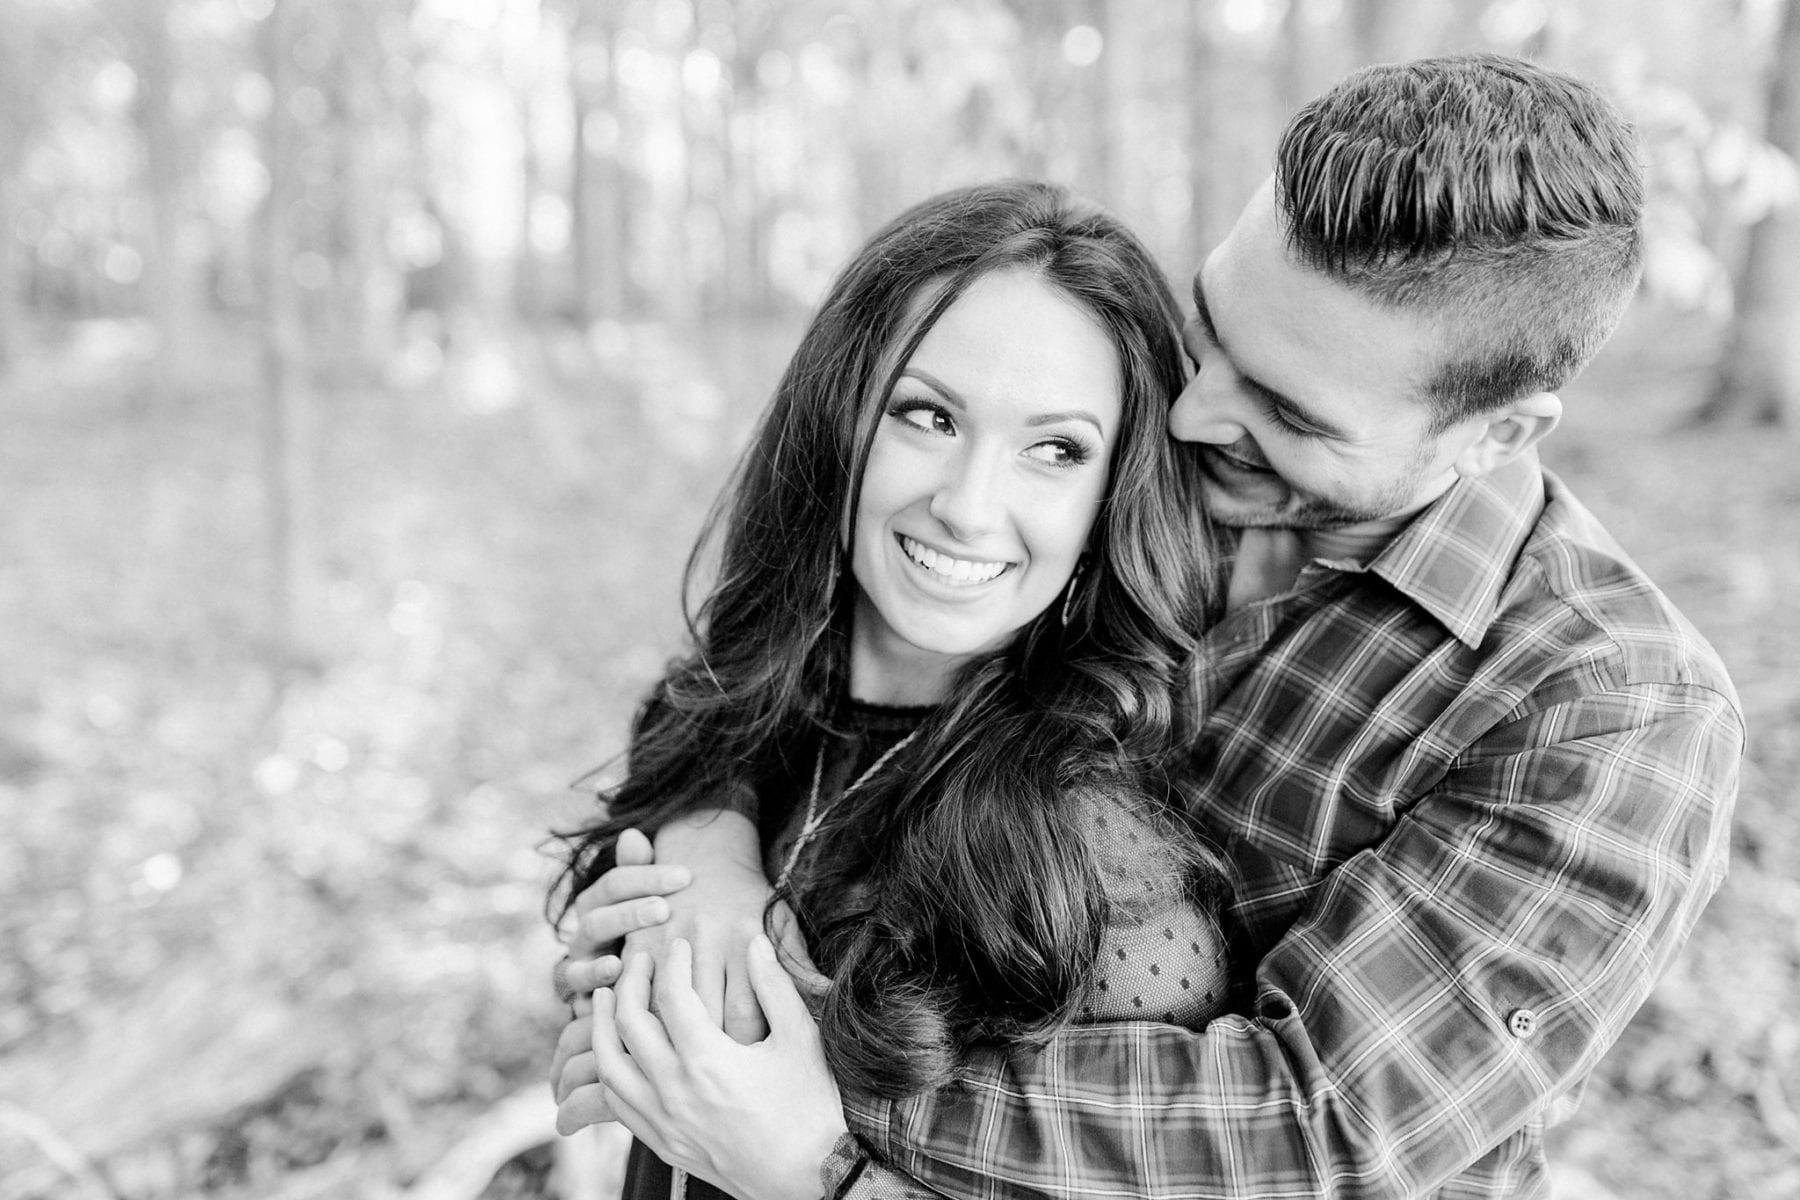 Manassas Battlefield Portraits Virginia Wedding Photographer Megan Kelsey Photography Lianne & Chris-63.jpg